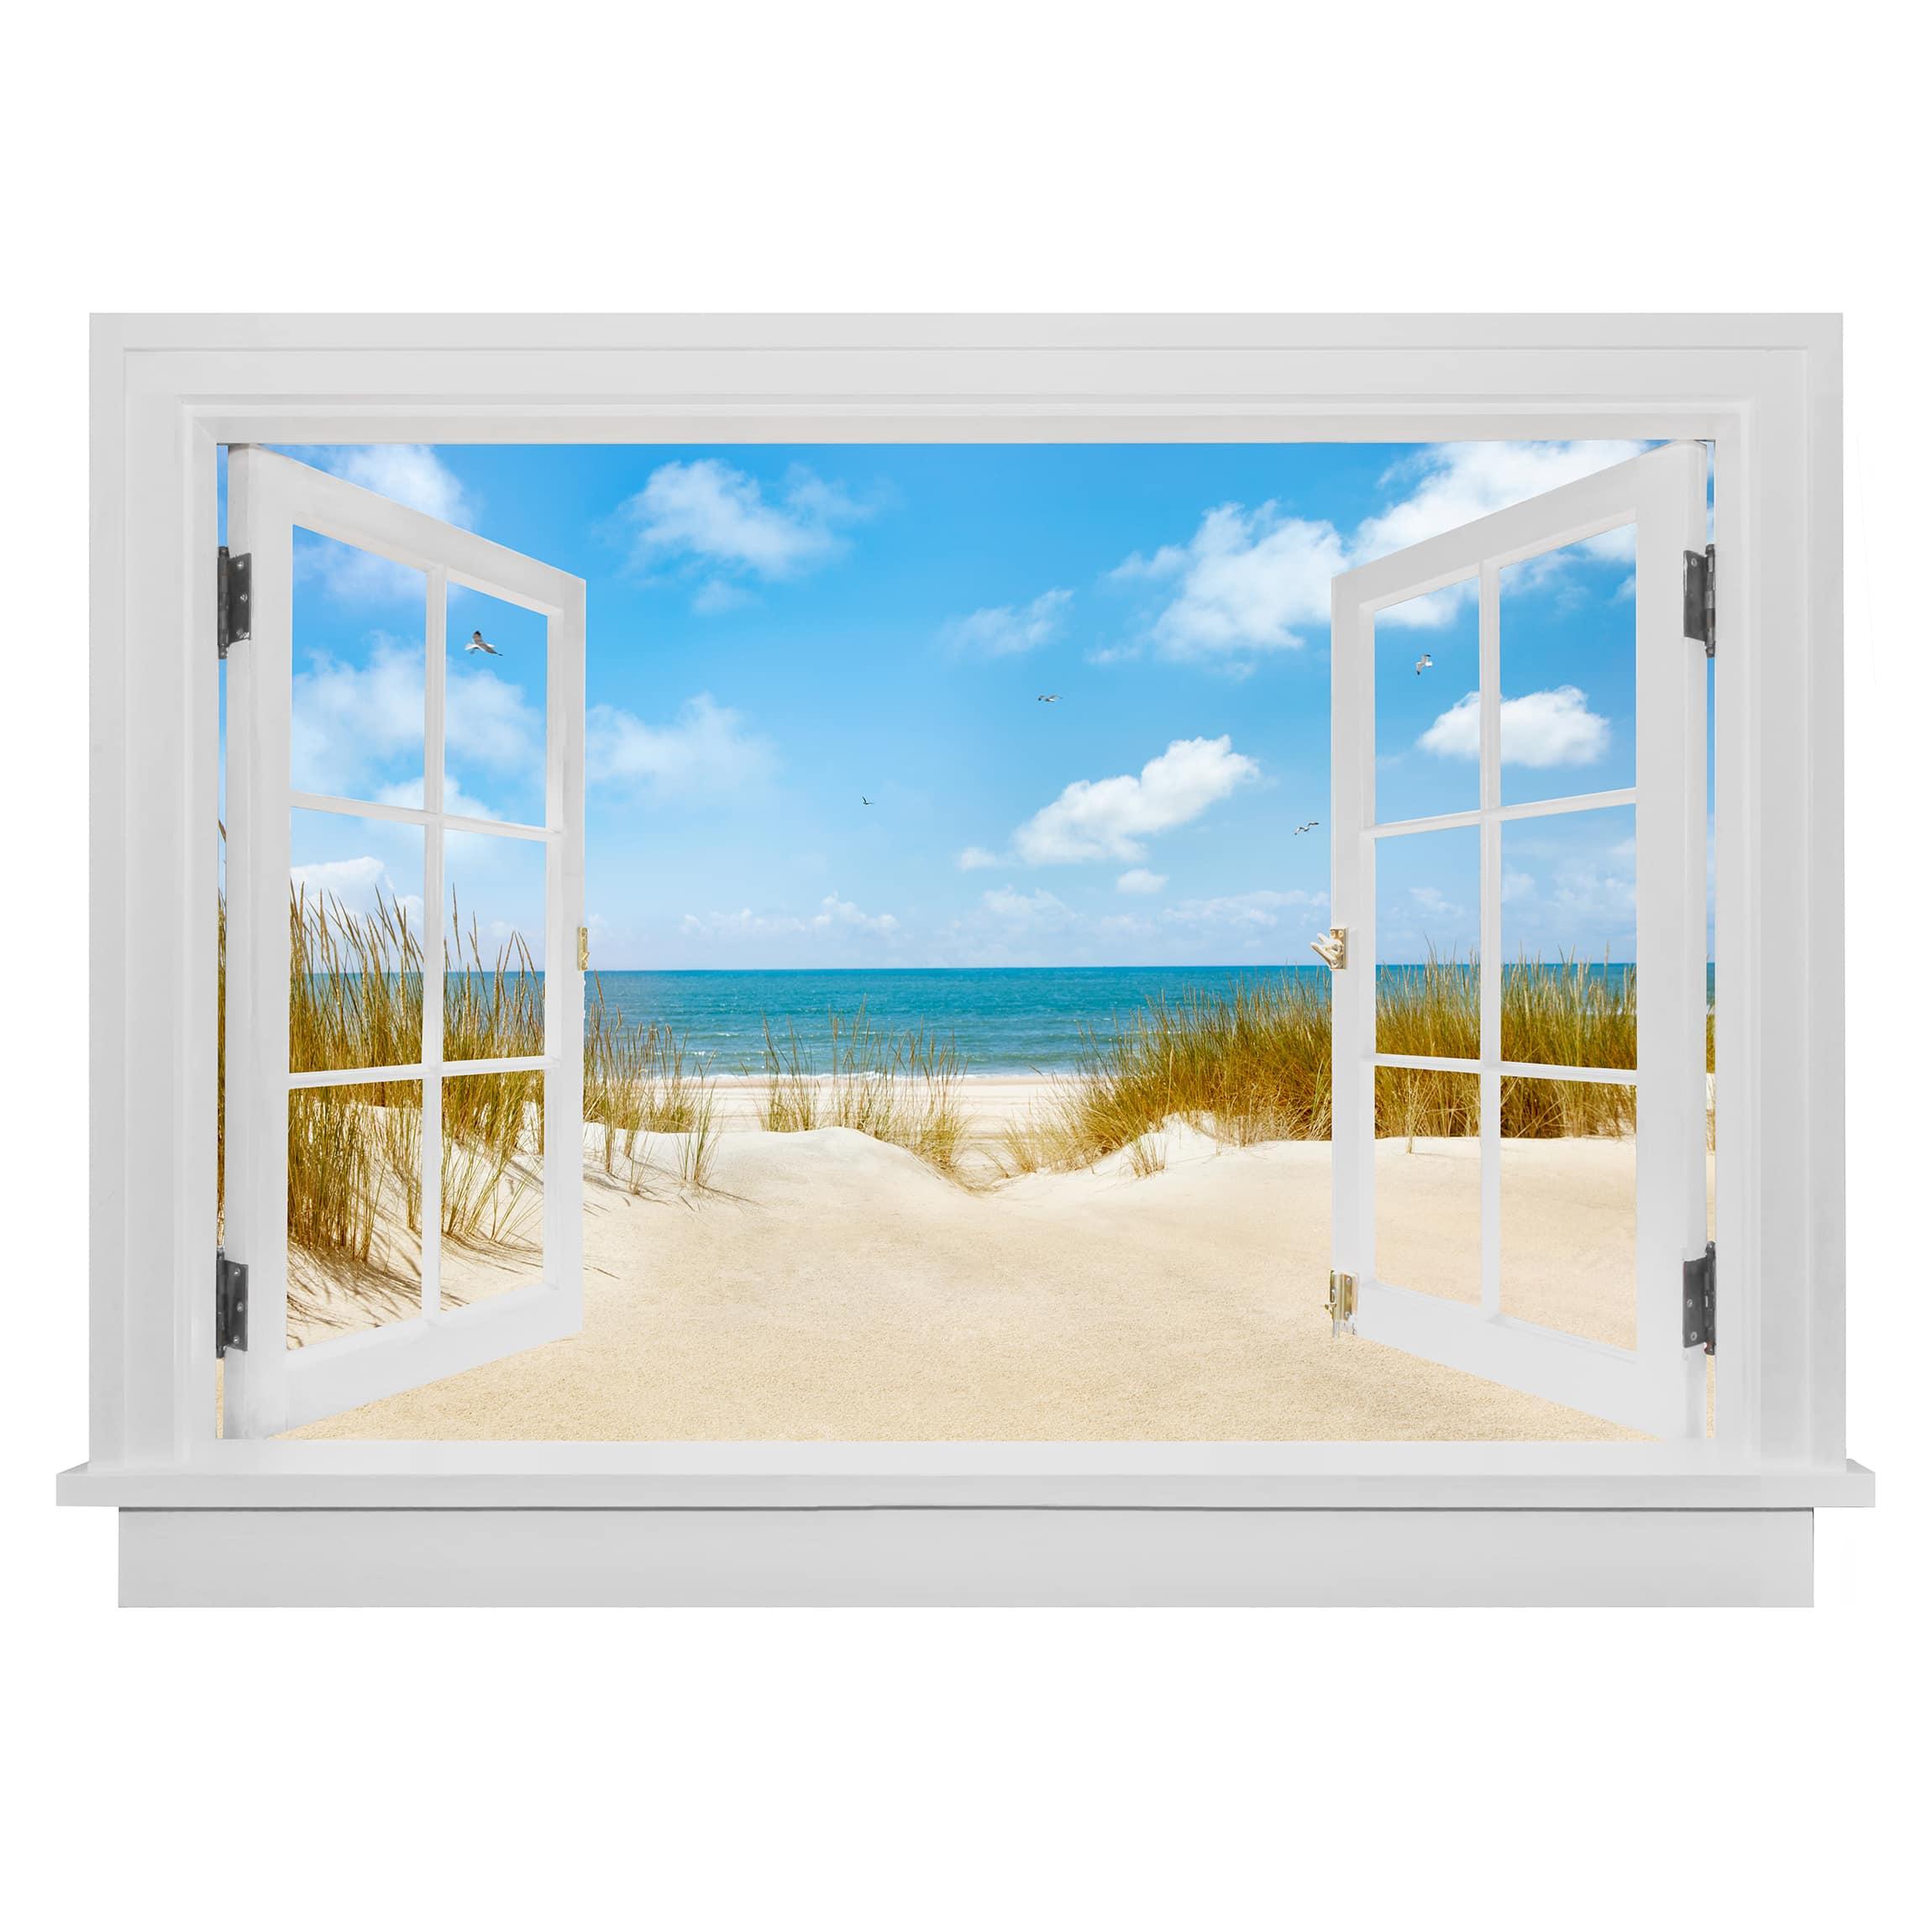 3D Wandtattoo fenes Fenster Strand an der Nordsee